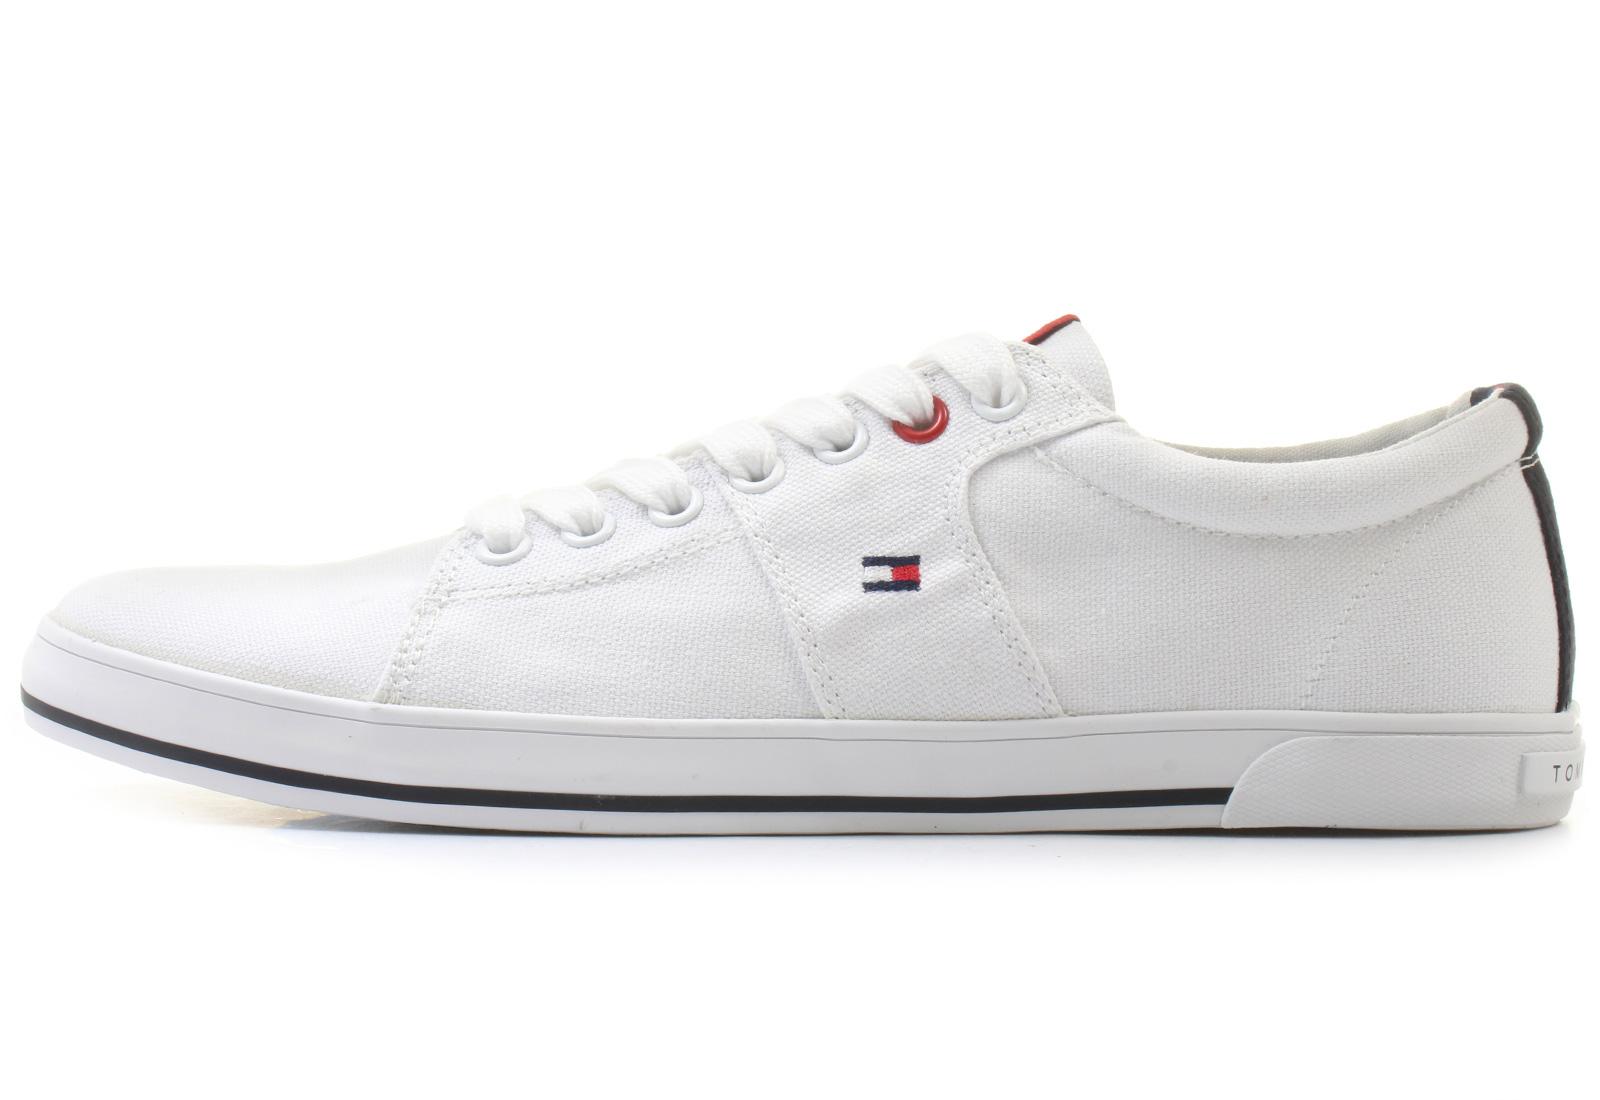 2a75aa7da6b4f6 Tommy Hilfiger Shoes - Harry 5d - 14S-6972-100 - Online shop for ...